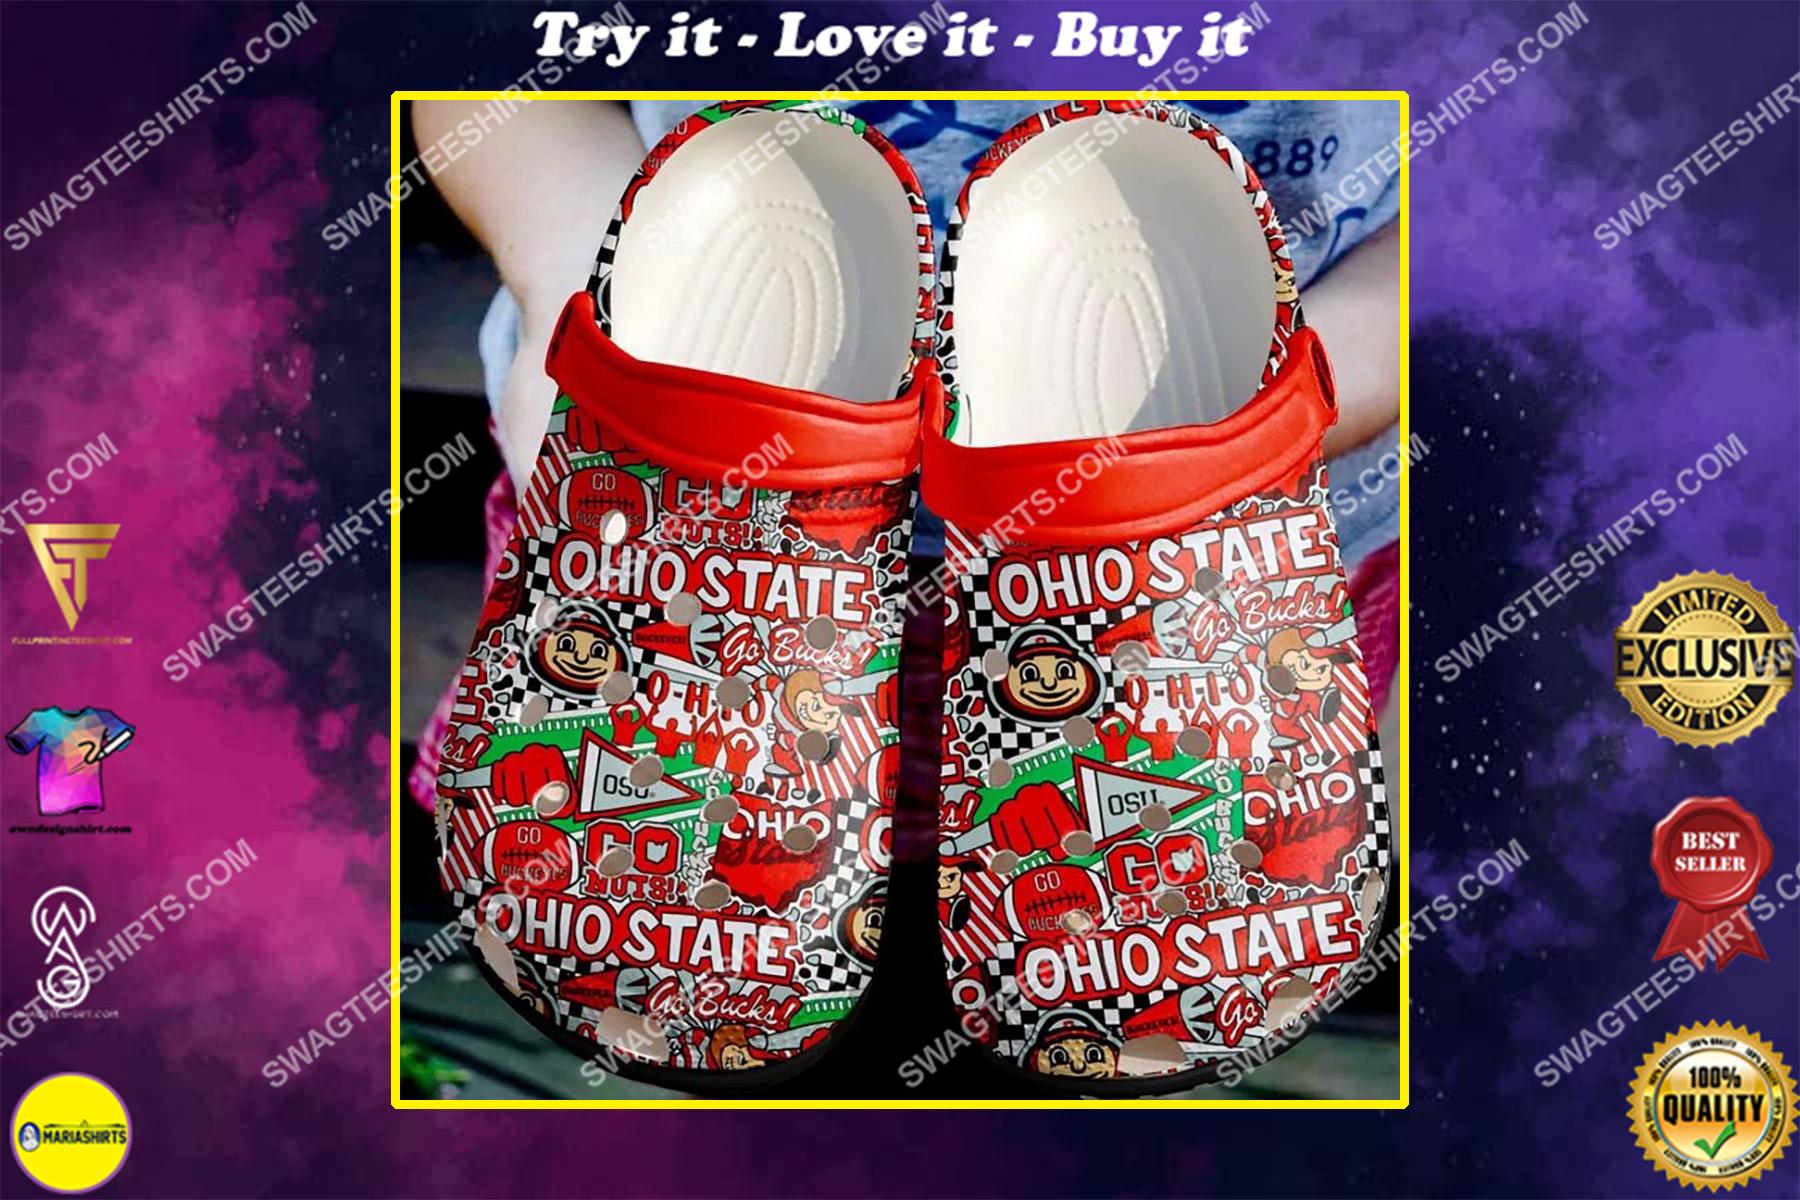 the ohio state buckeyes football all over printed crocs crocband clog